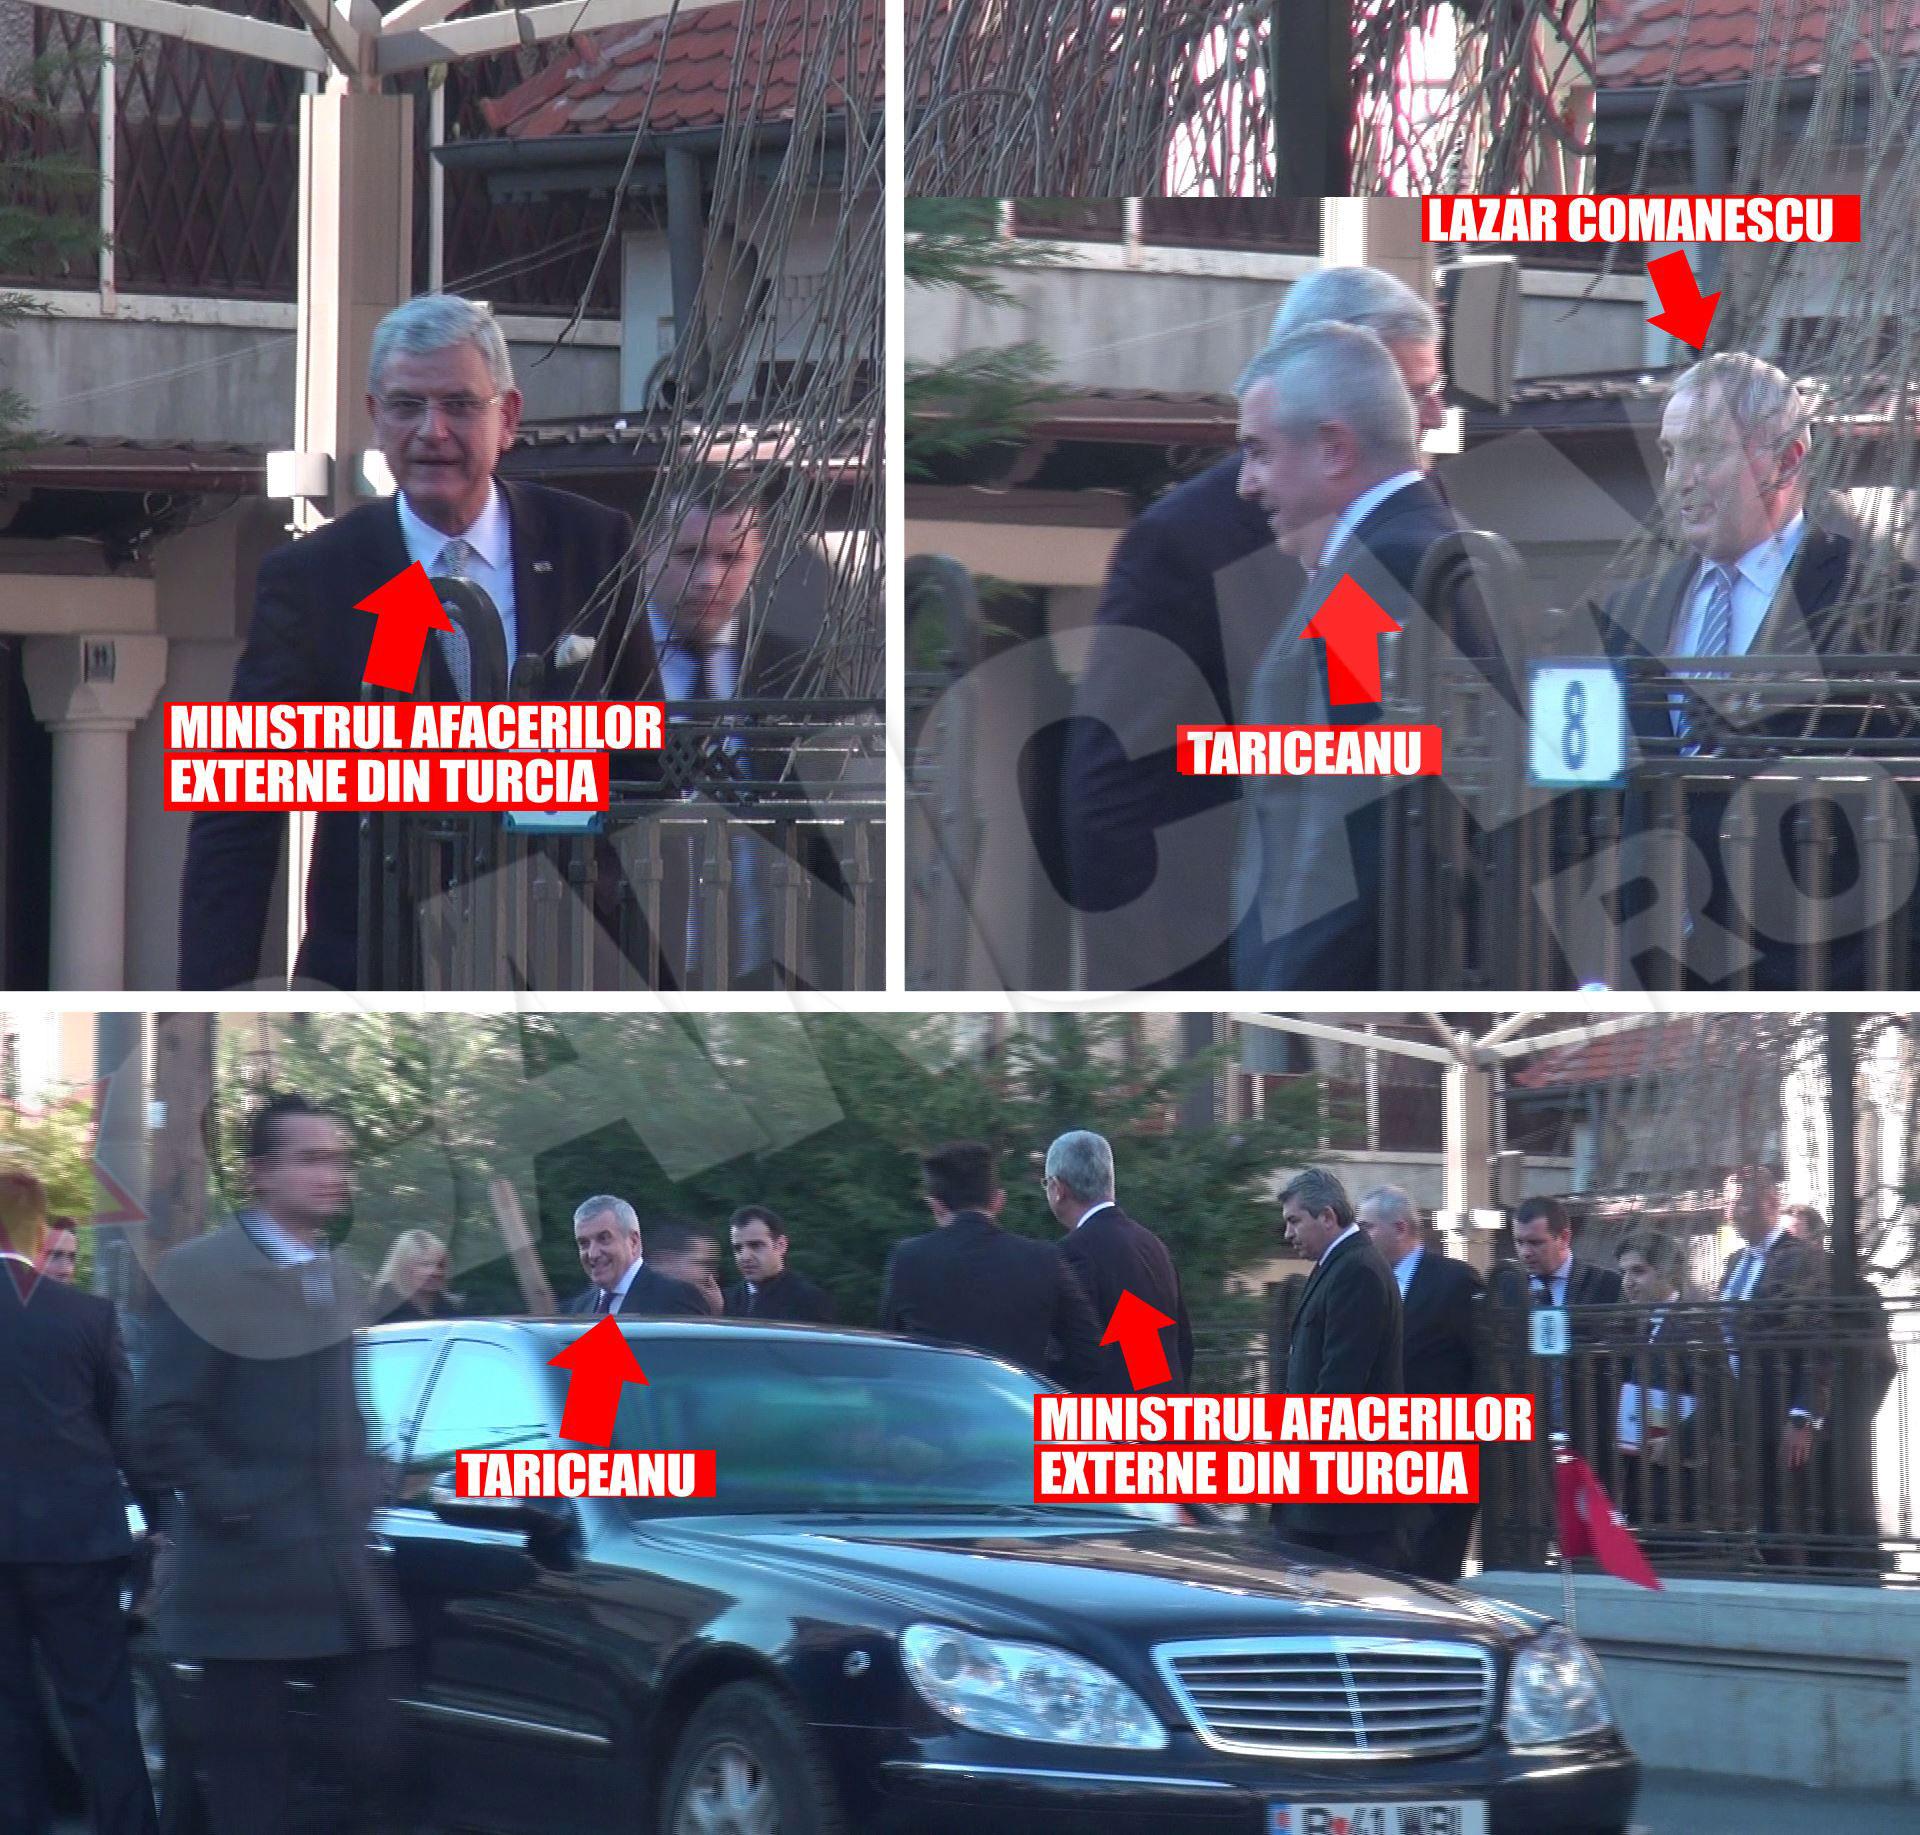 Calin Popescu Tariceanu a fost bine pazit la intalnirea de la restaurant